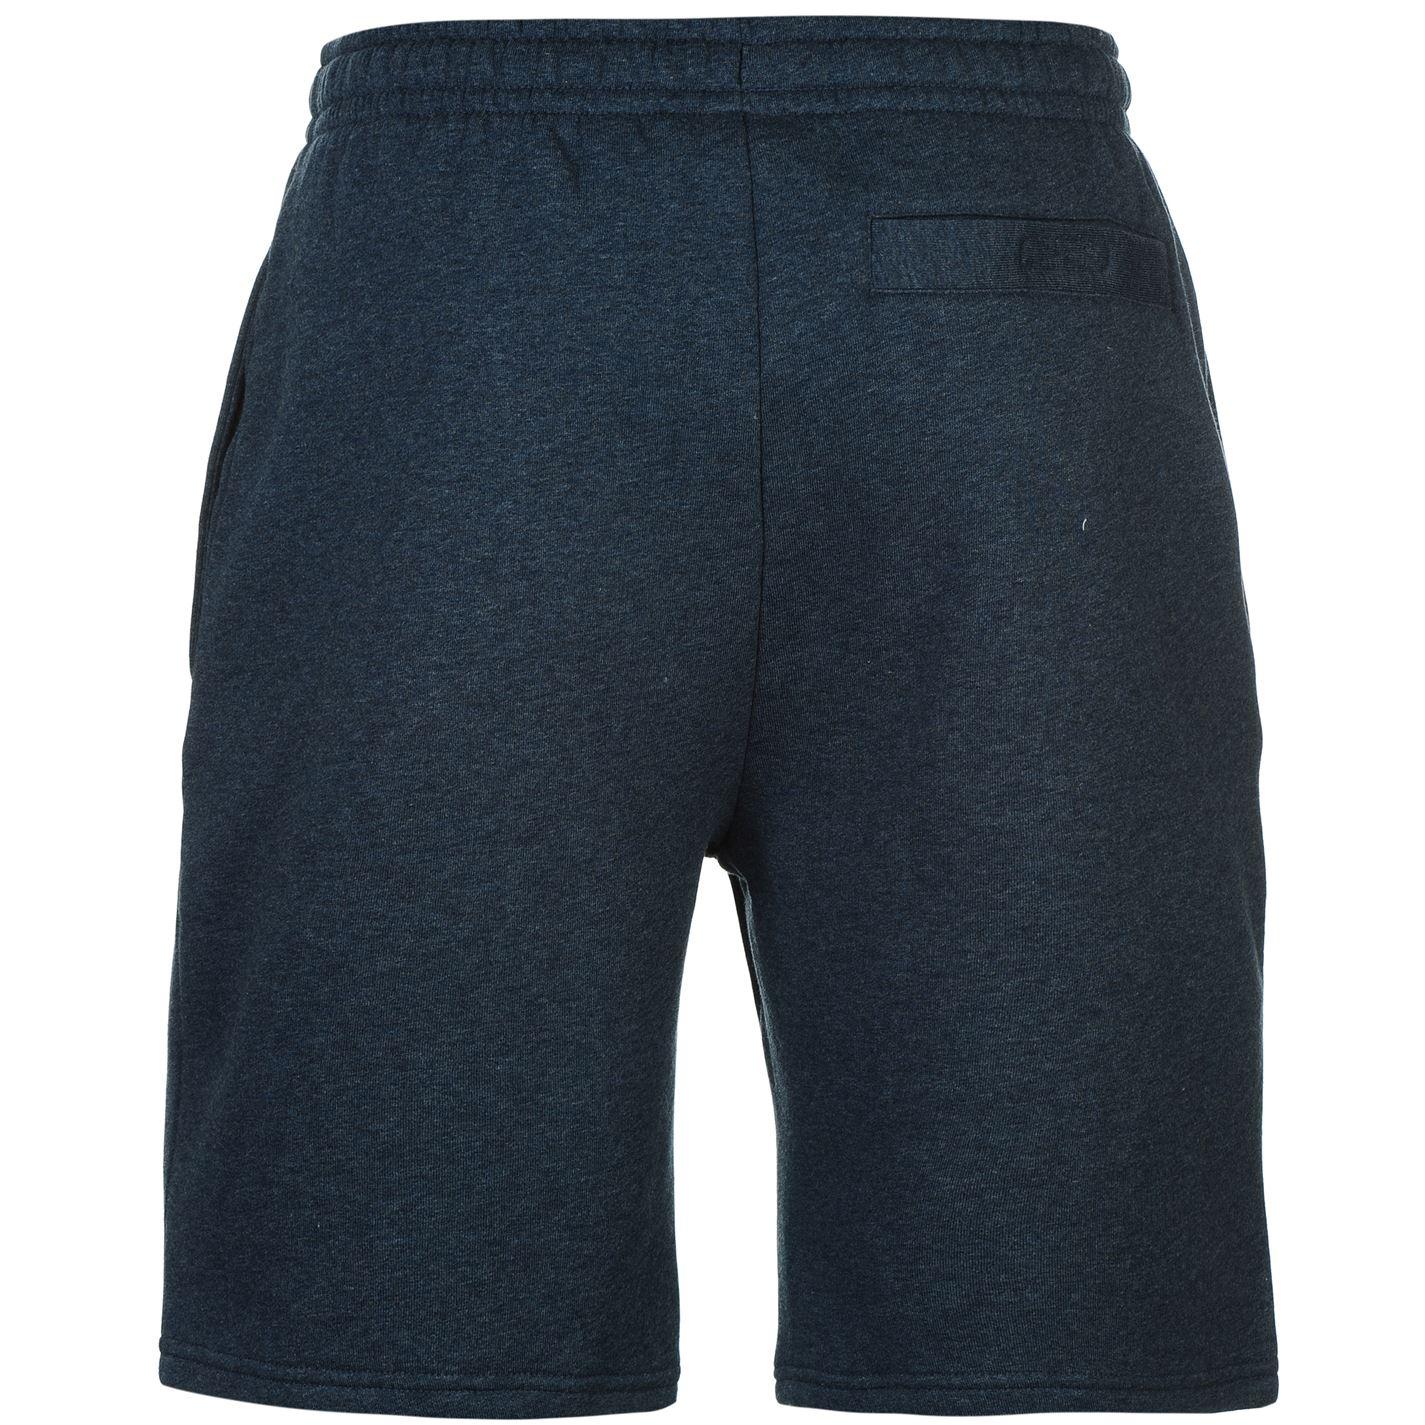 Lacoste-Fleece-Jogger-Shorts-Mens thumbnail 8